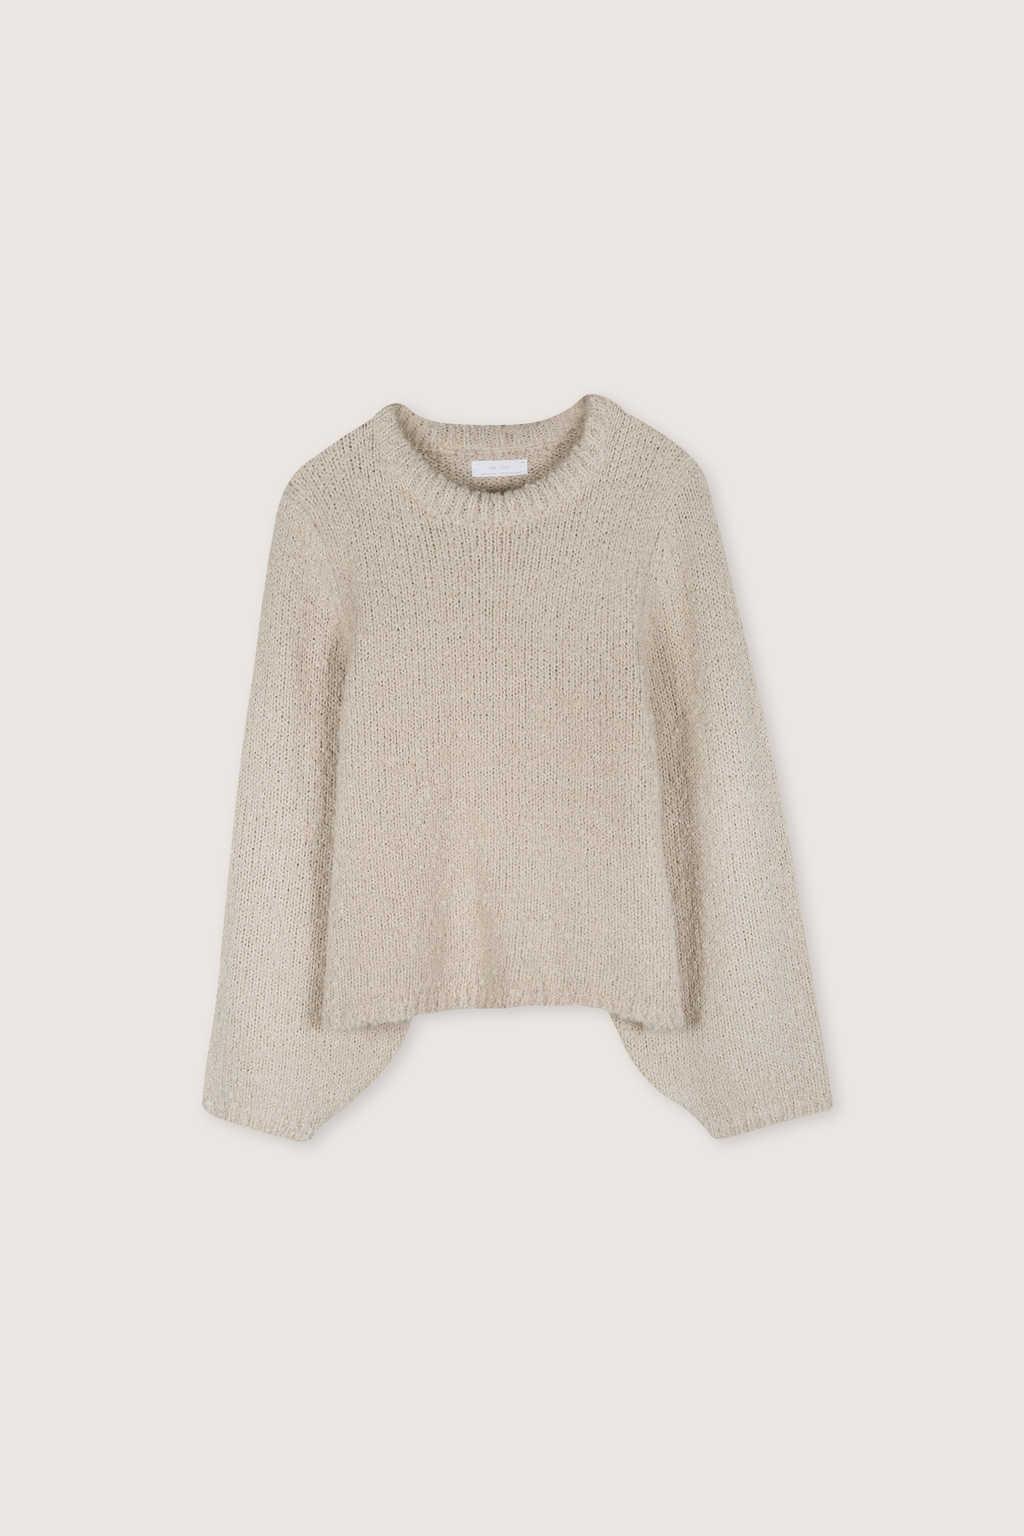 Sweater 1953 Gray 6